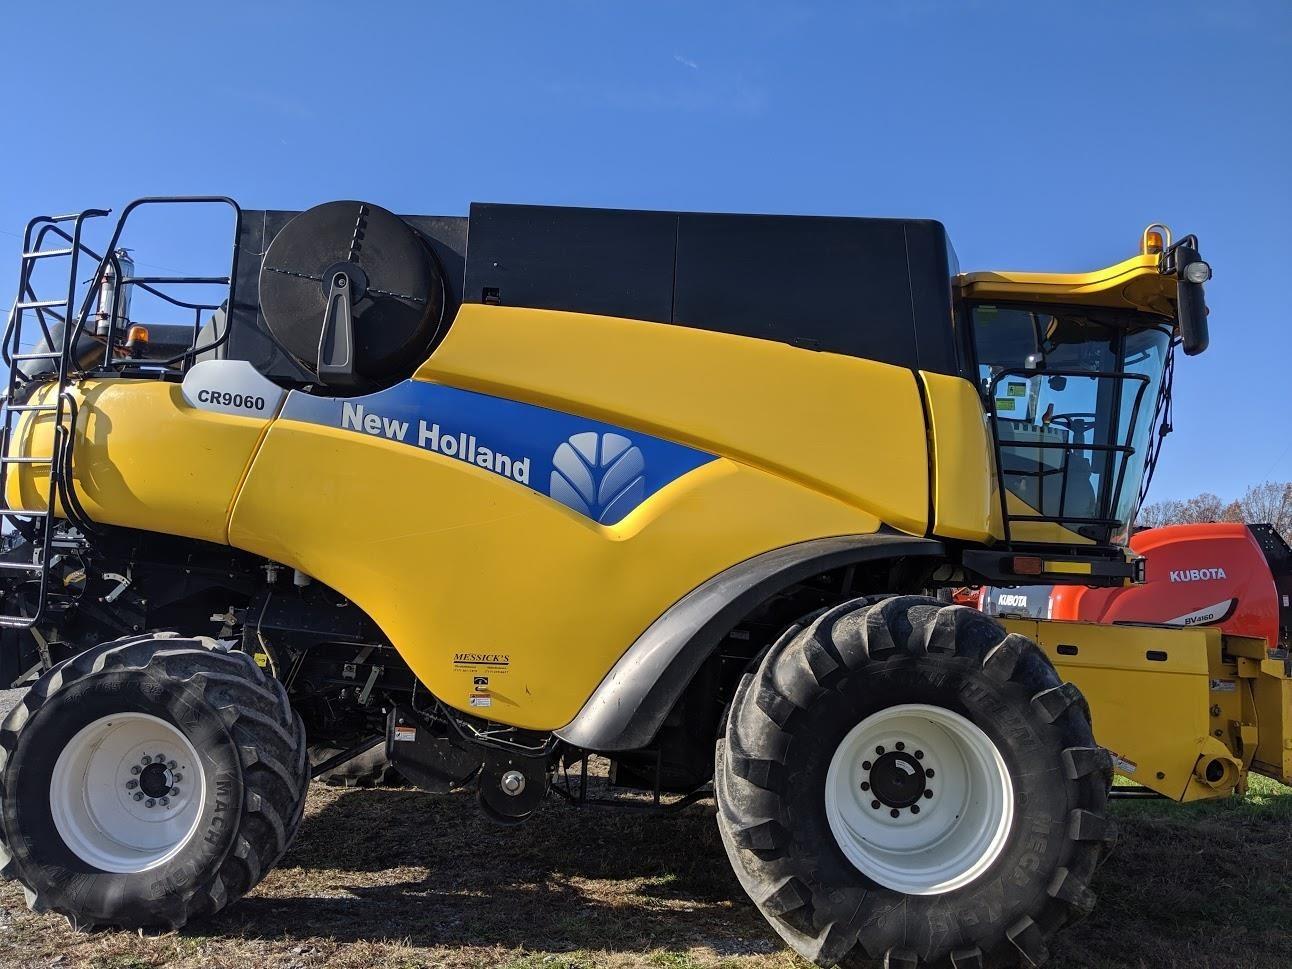 New Holland CR9060 Combine